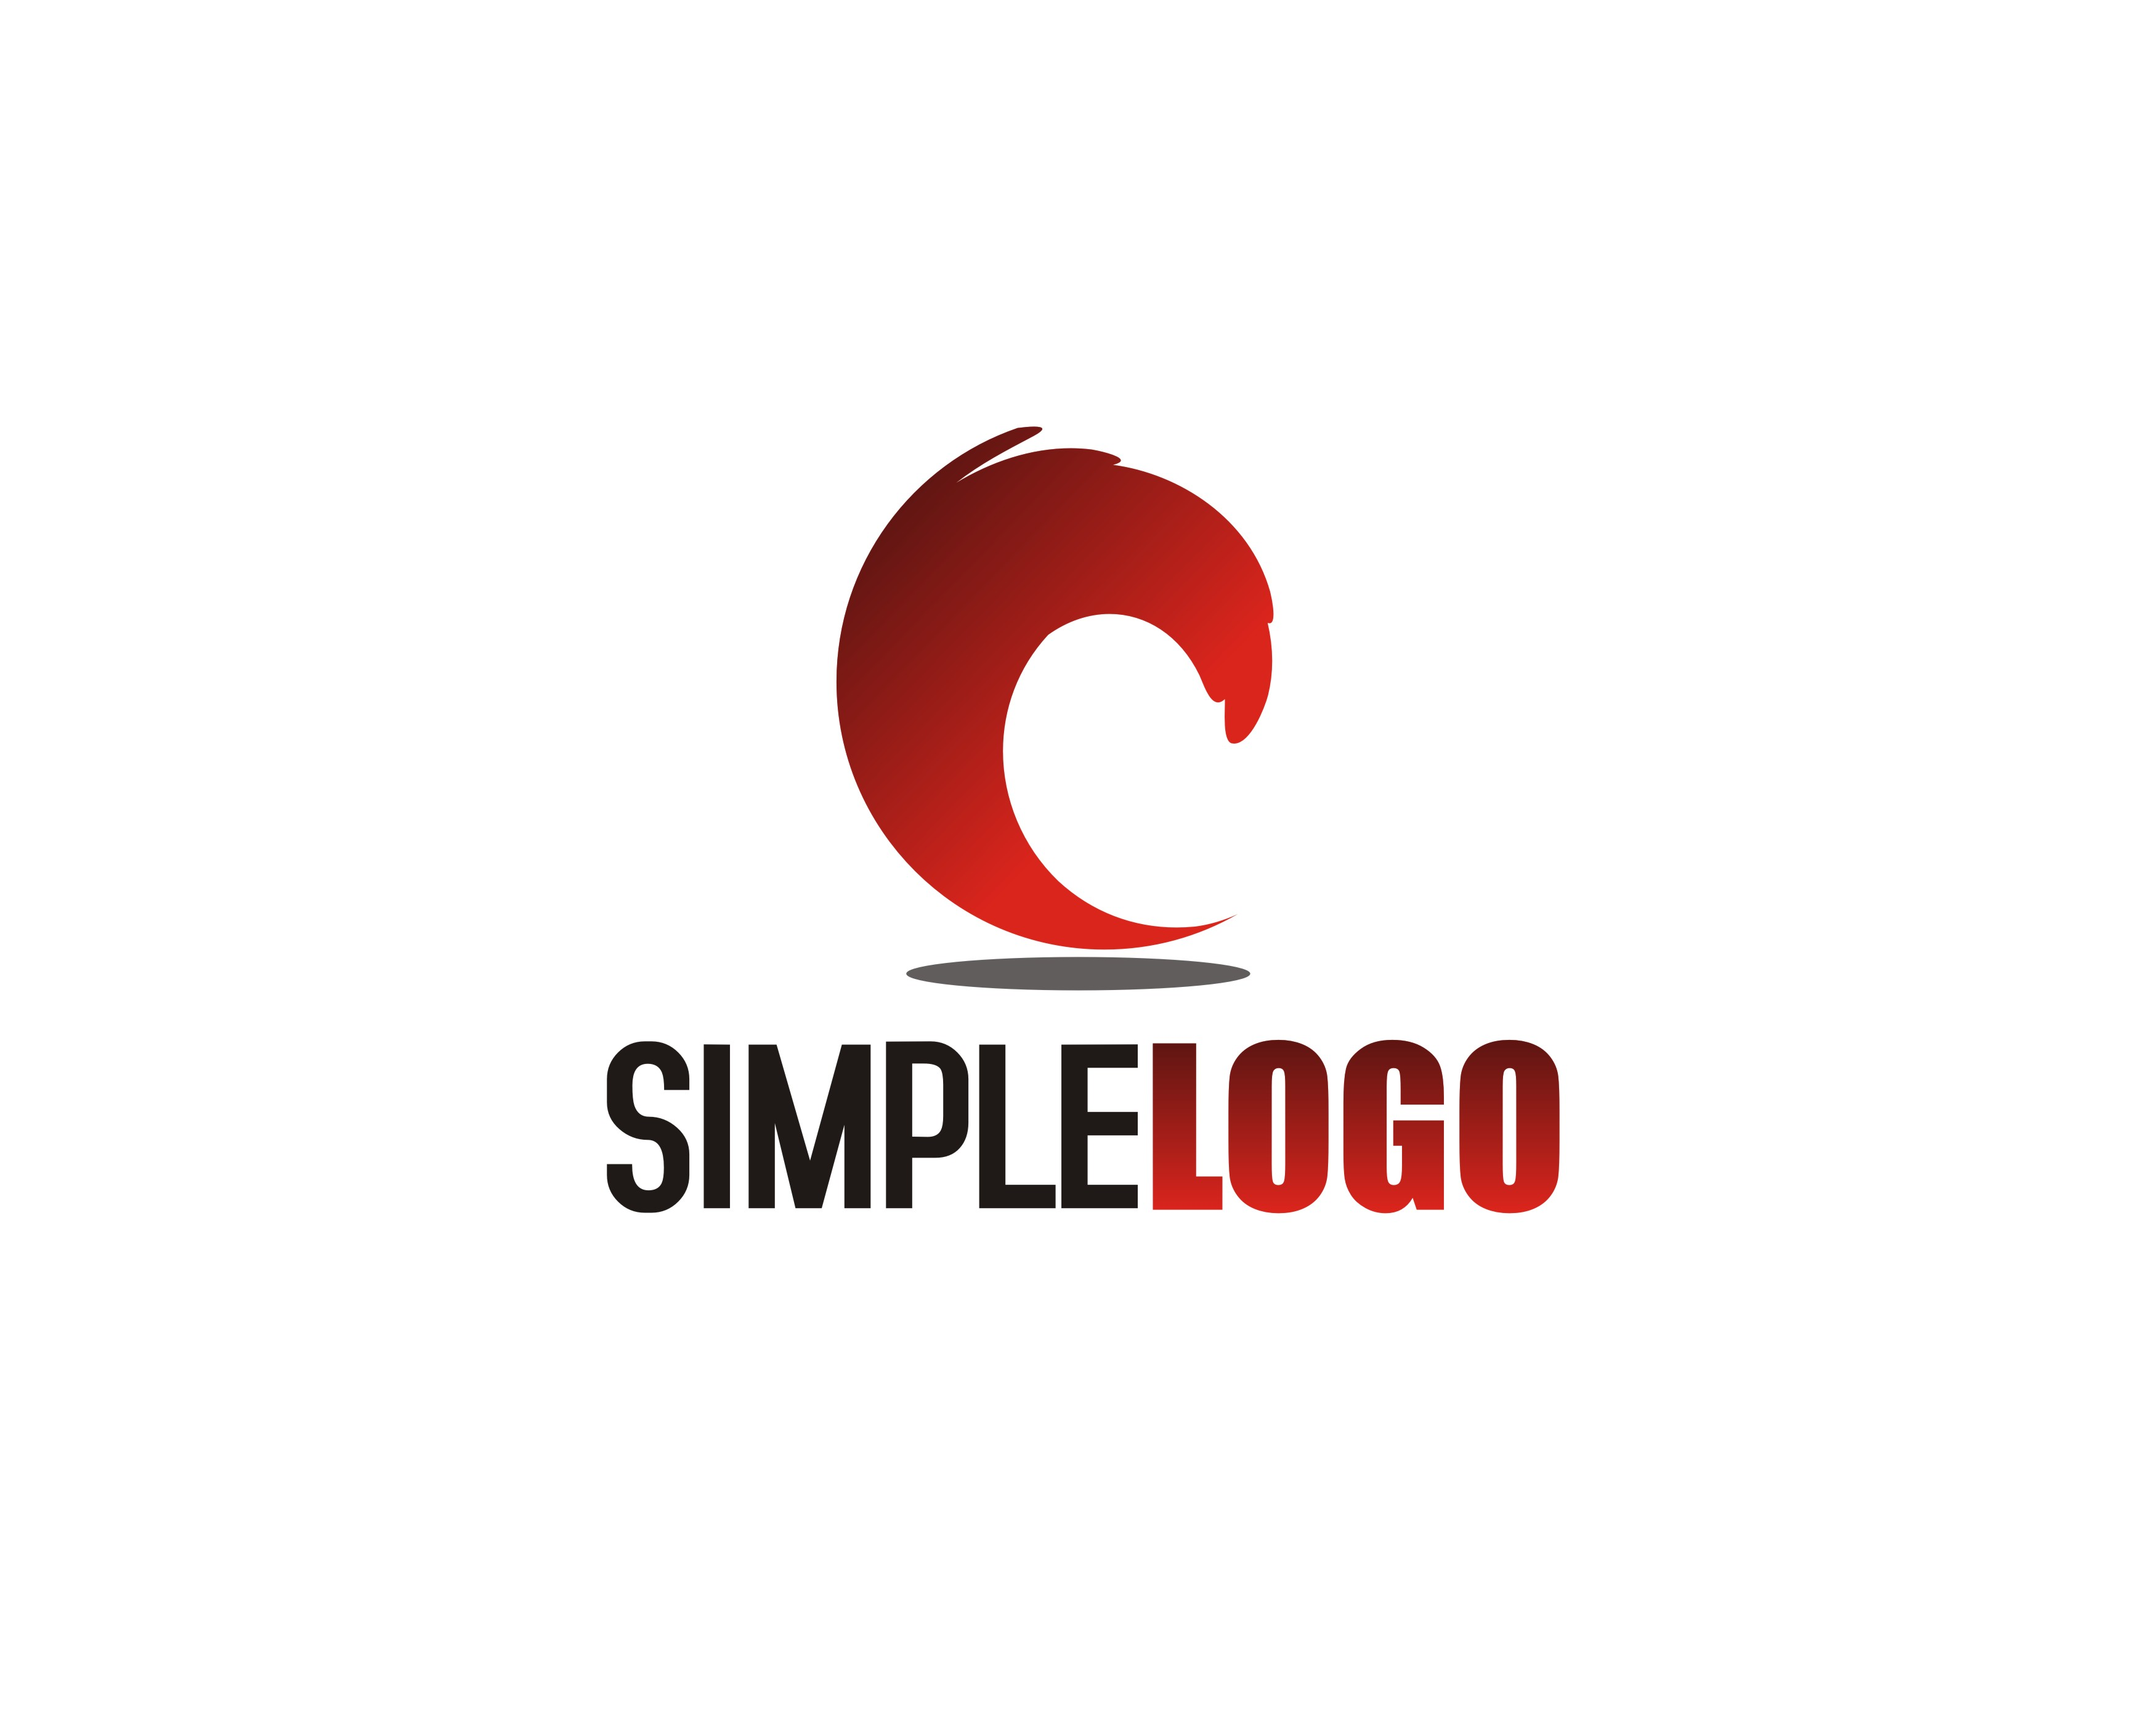 Logo Design Ideas For It Company Logo Design Ideas Logo Design By Pegasusmultimediagh Pegasusmultimediagh Fashion Logos Logo Apparel Fashion And Apparel Logo Design Ideas Sky Life Residences Logo Design Ideas Resume